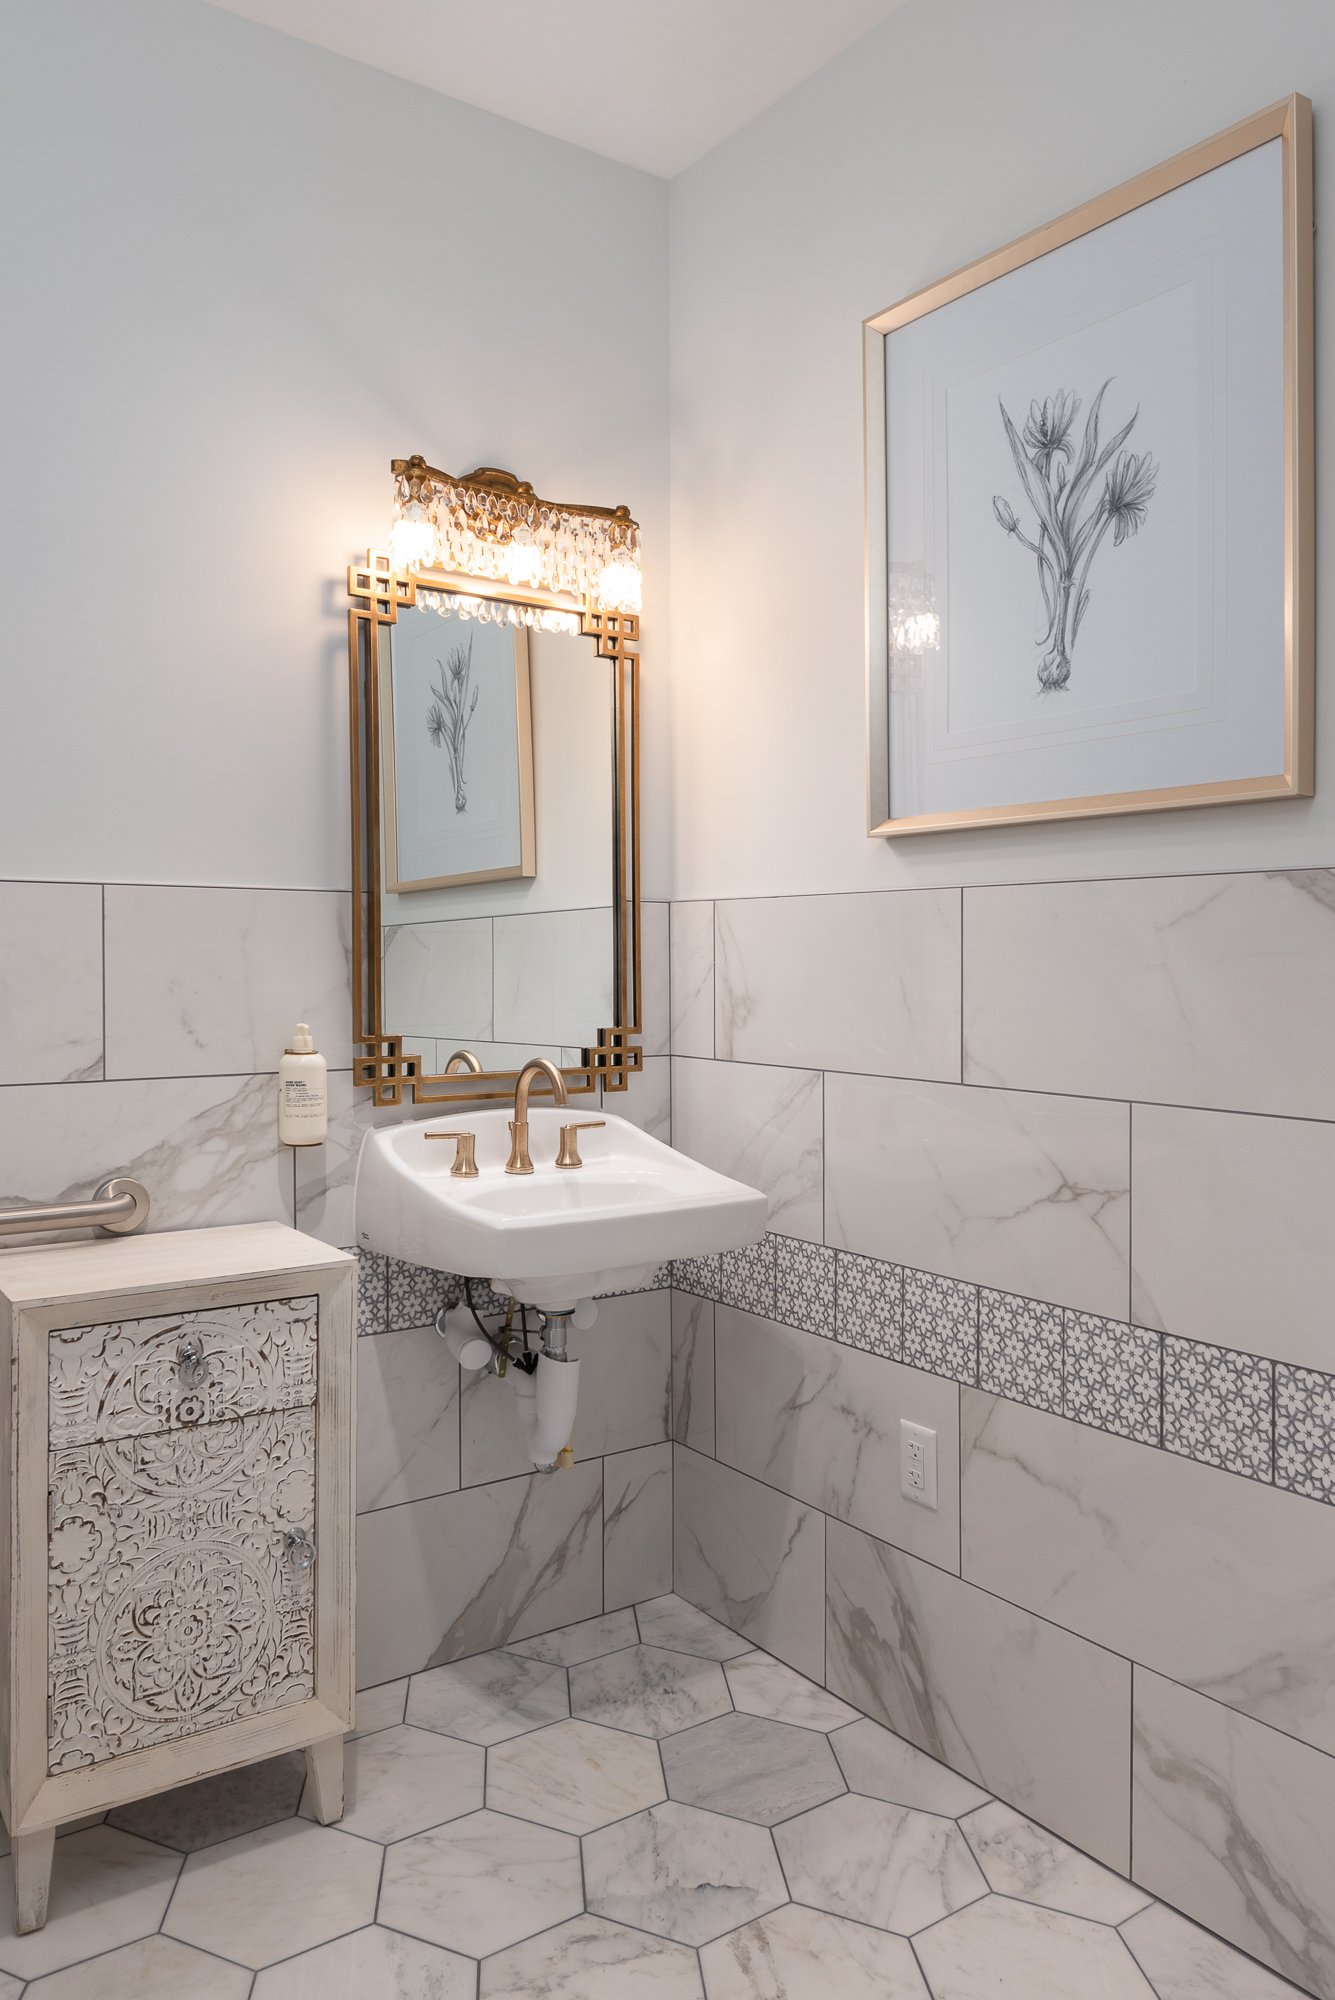 Micamy Design Studio_Interior Design_Clay Theatre_Event Space_Venue_Marble_Art Deco_Modern_Bridal Suite_Tile_Flower_Bathroom (2).jpg